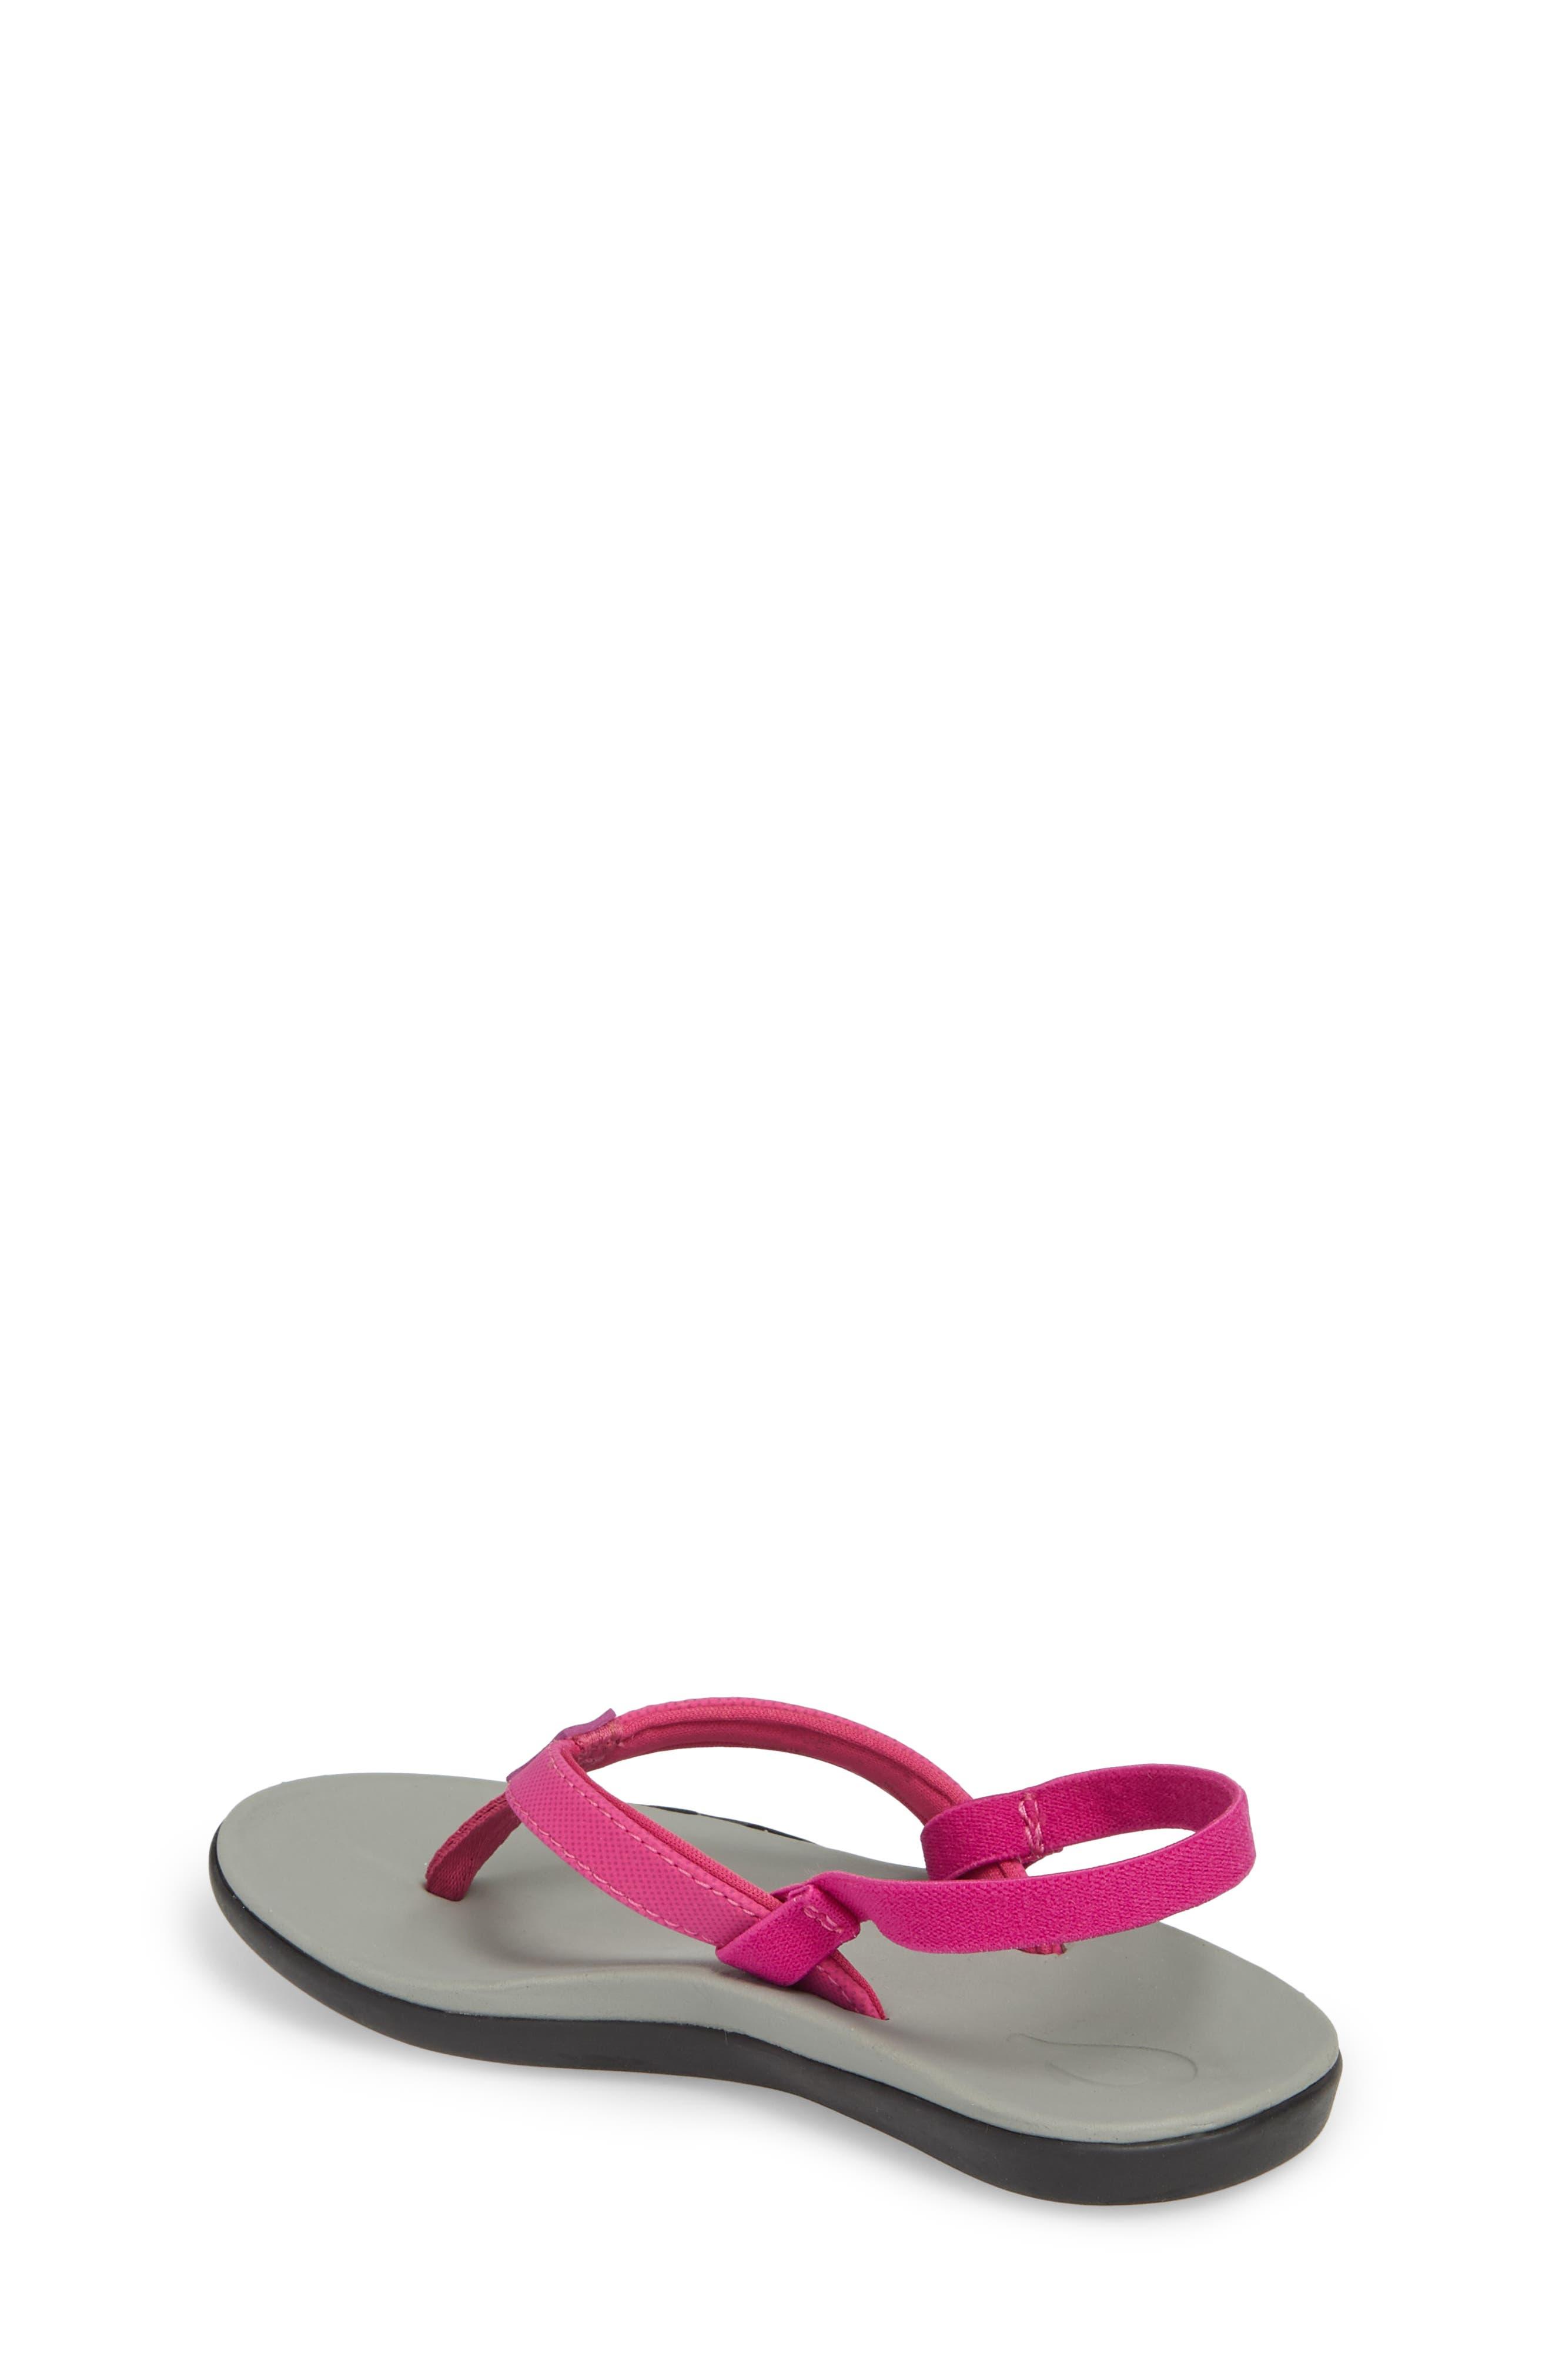 Ho'opio Sandal,                             Alternate thumbnail 2, color,                             Grape Juice/ Pale Grey